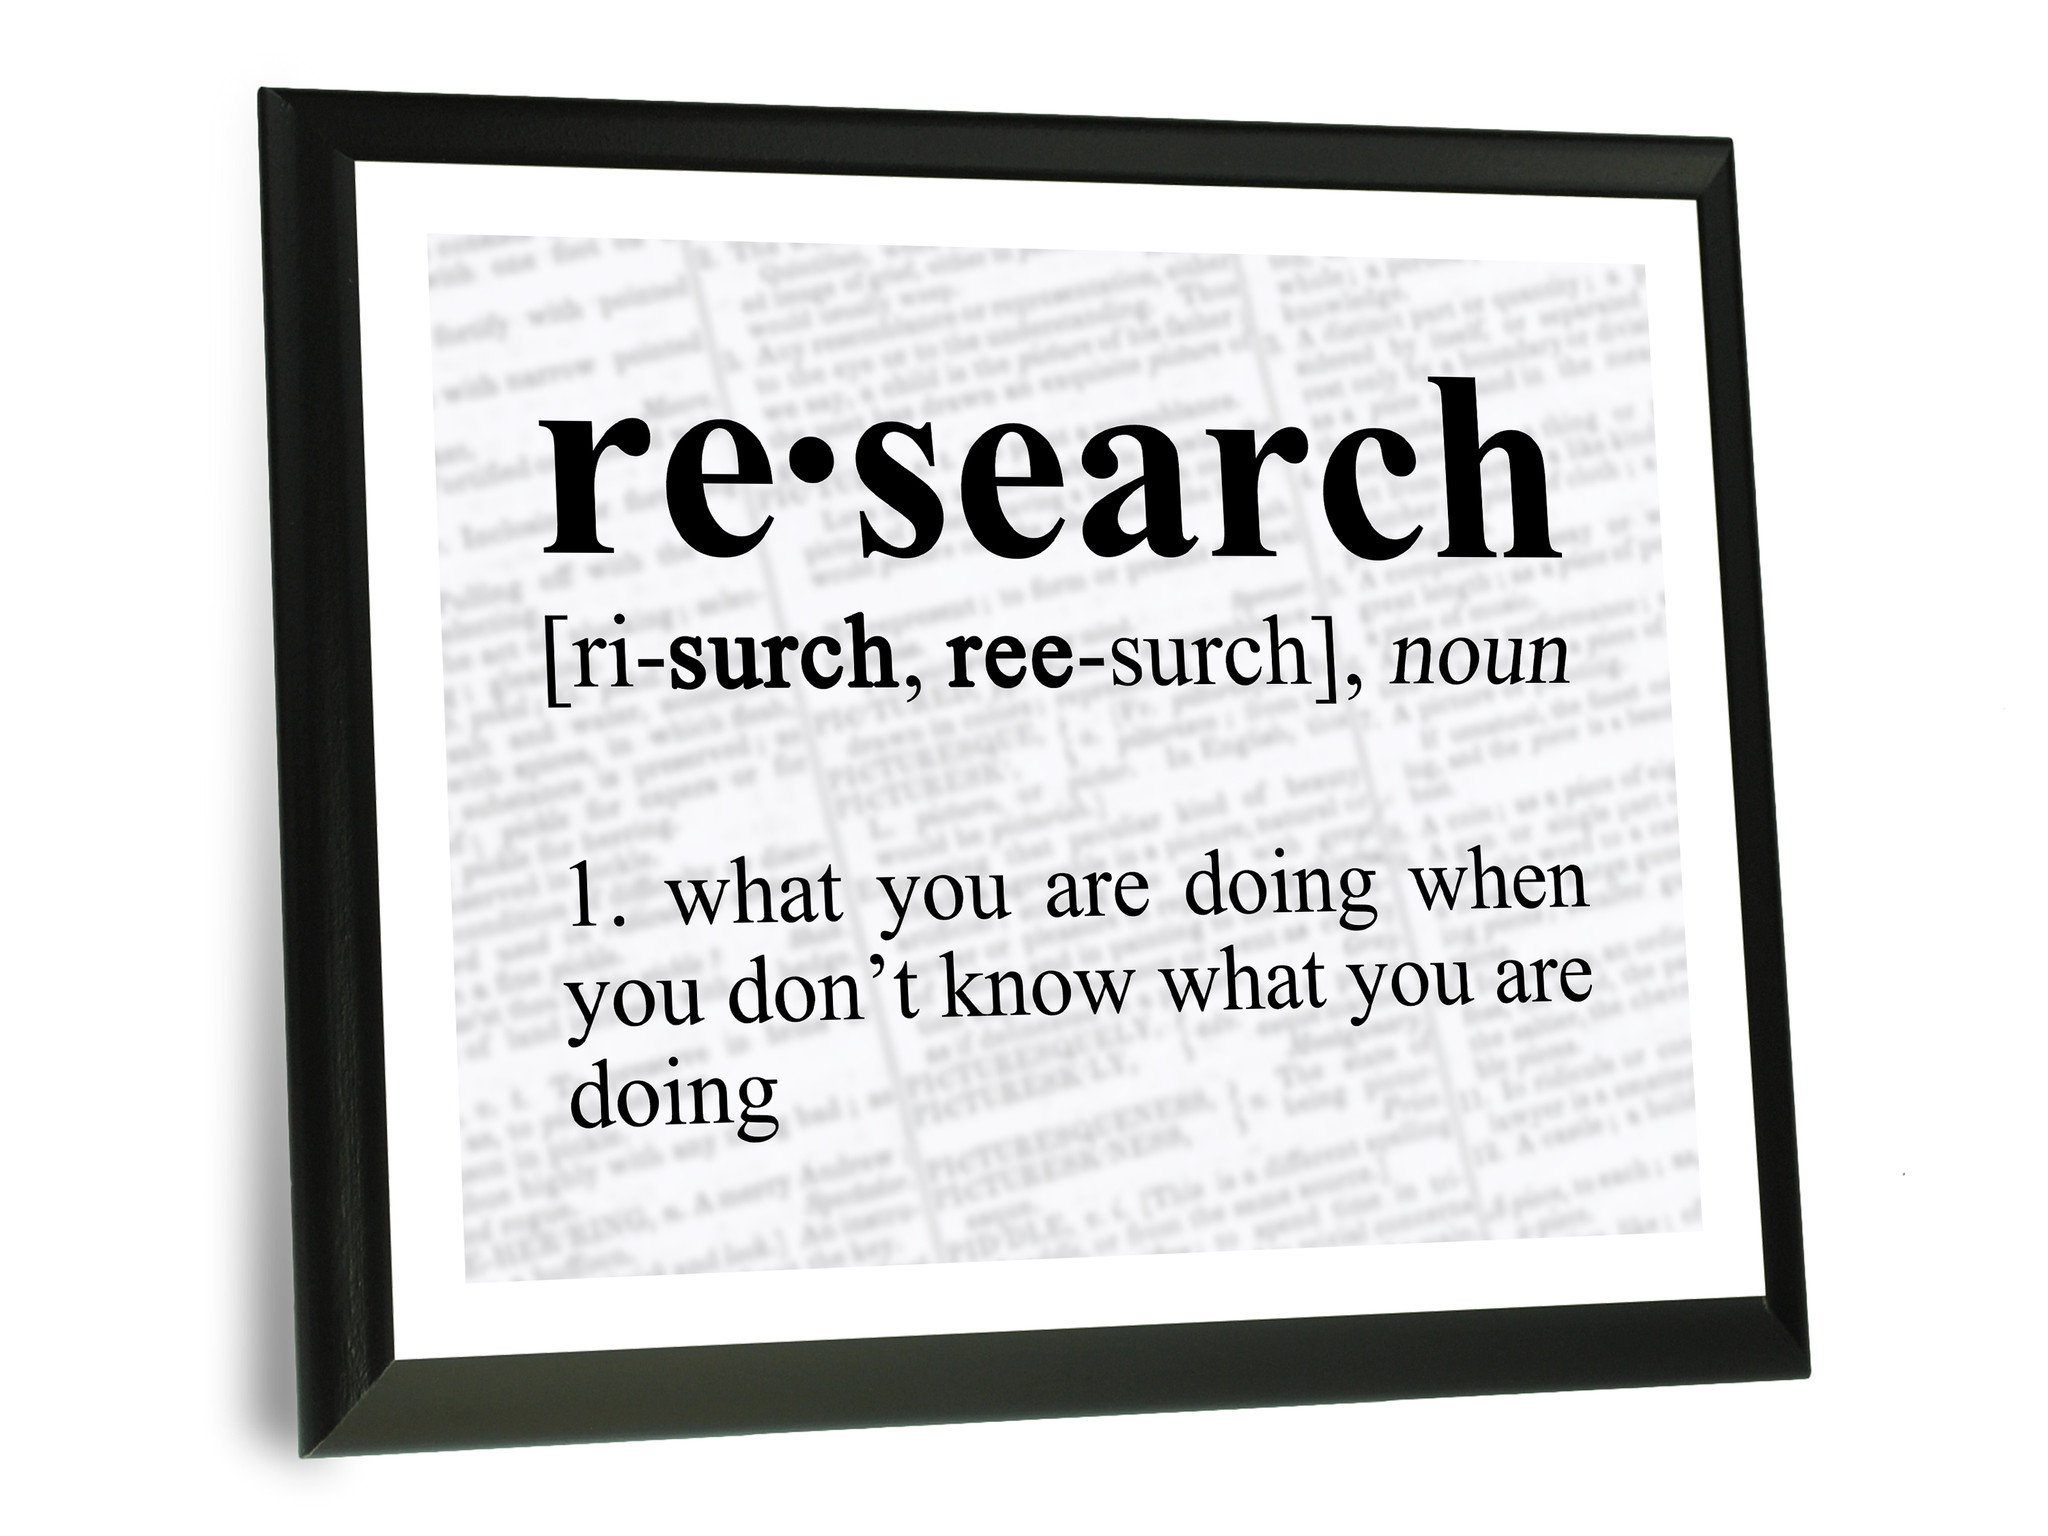 Research w internecie